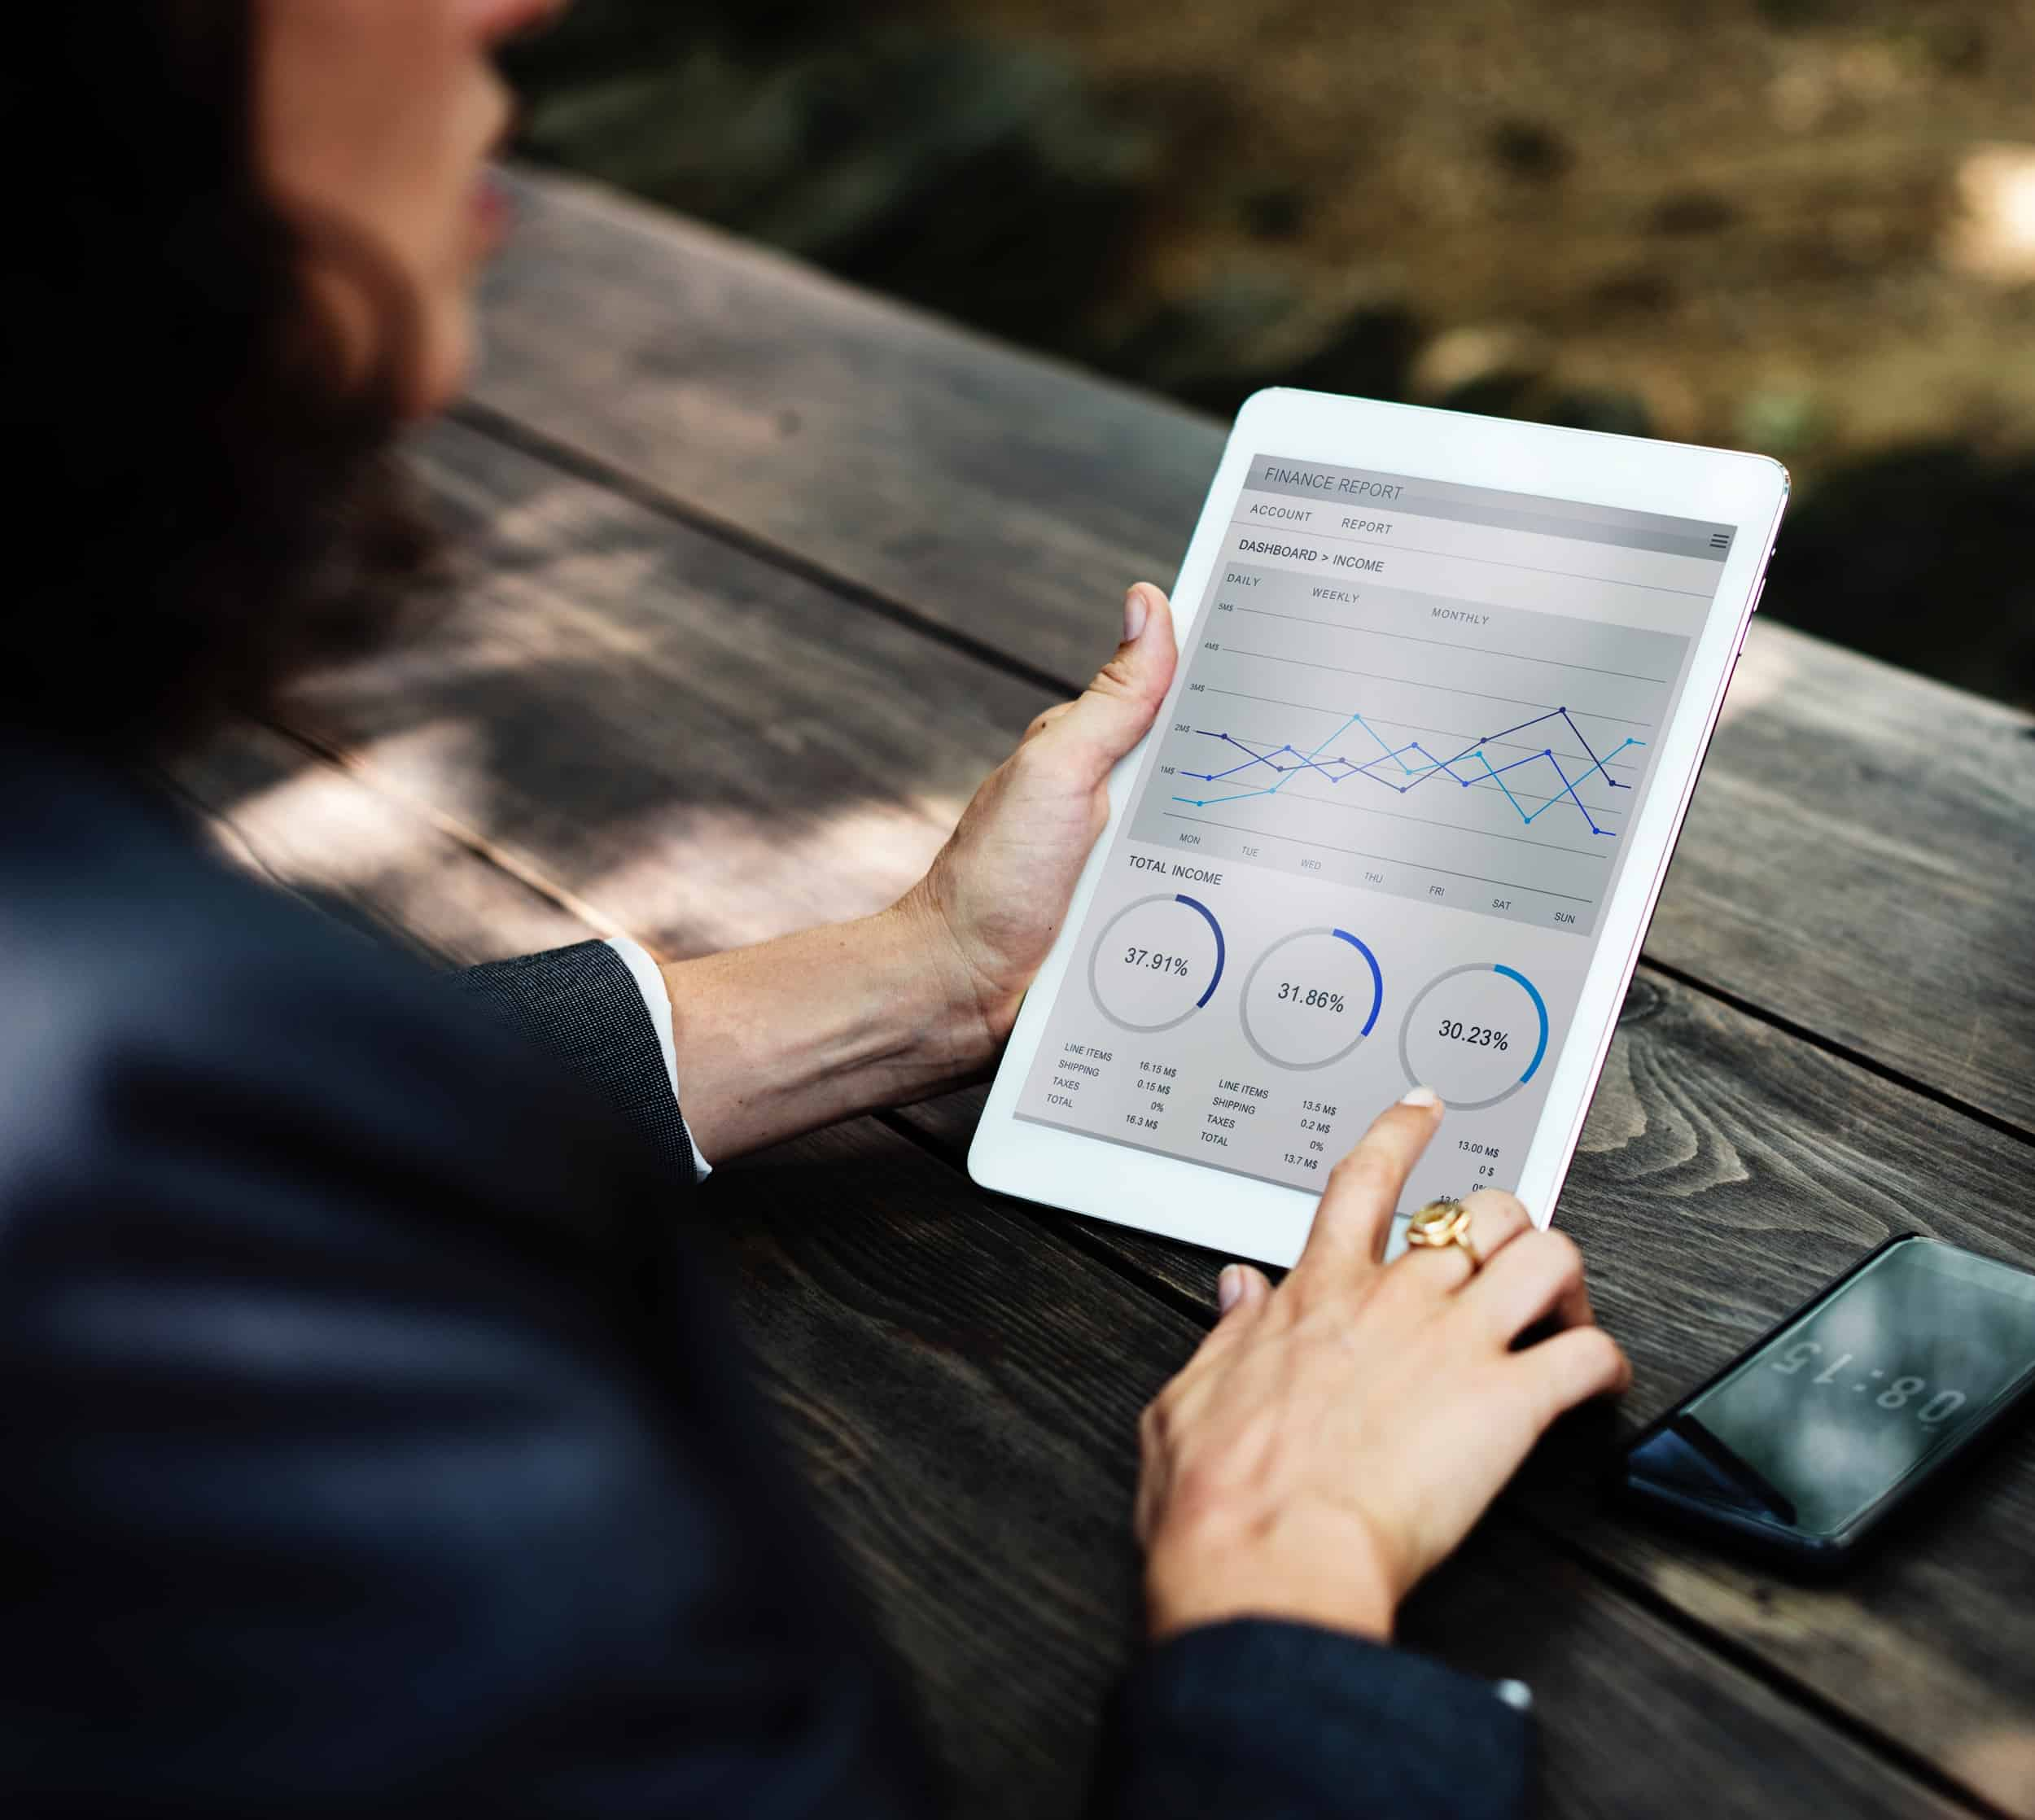 customer survey analytics and reporting